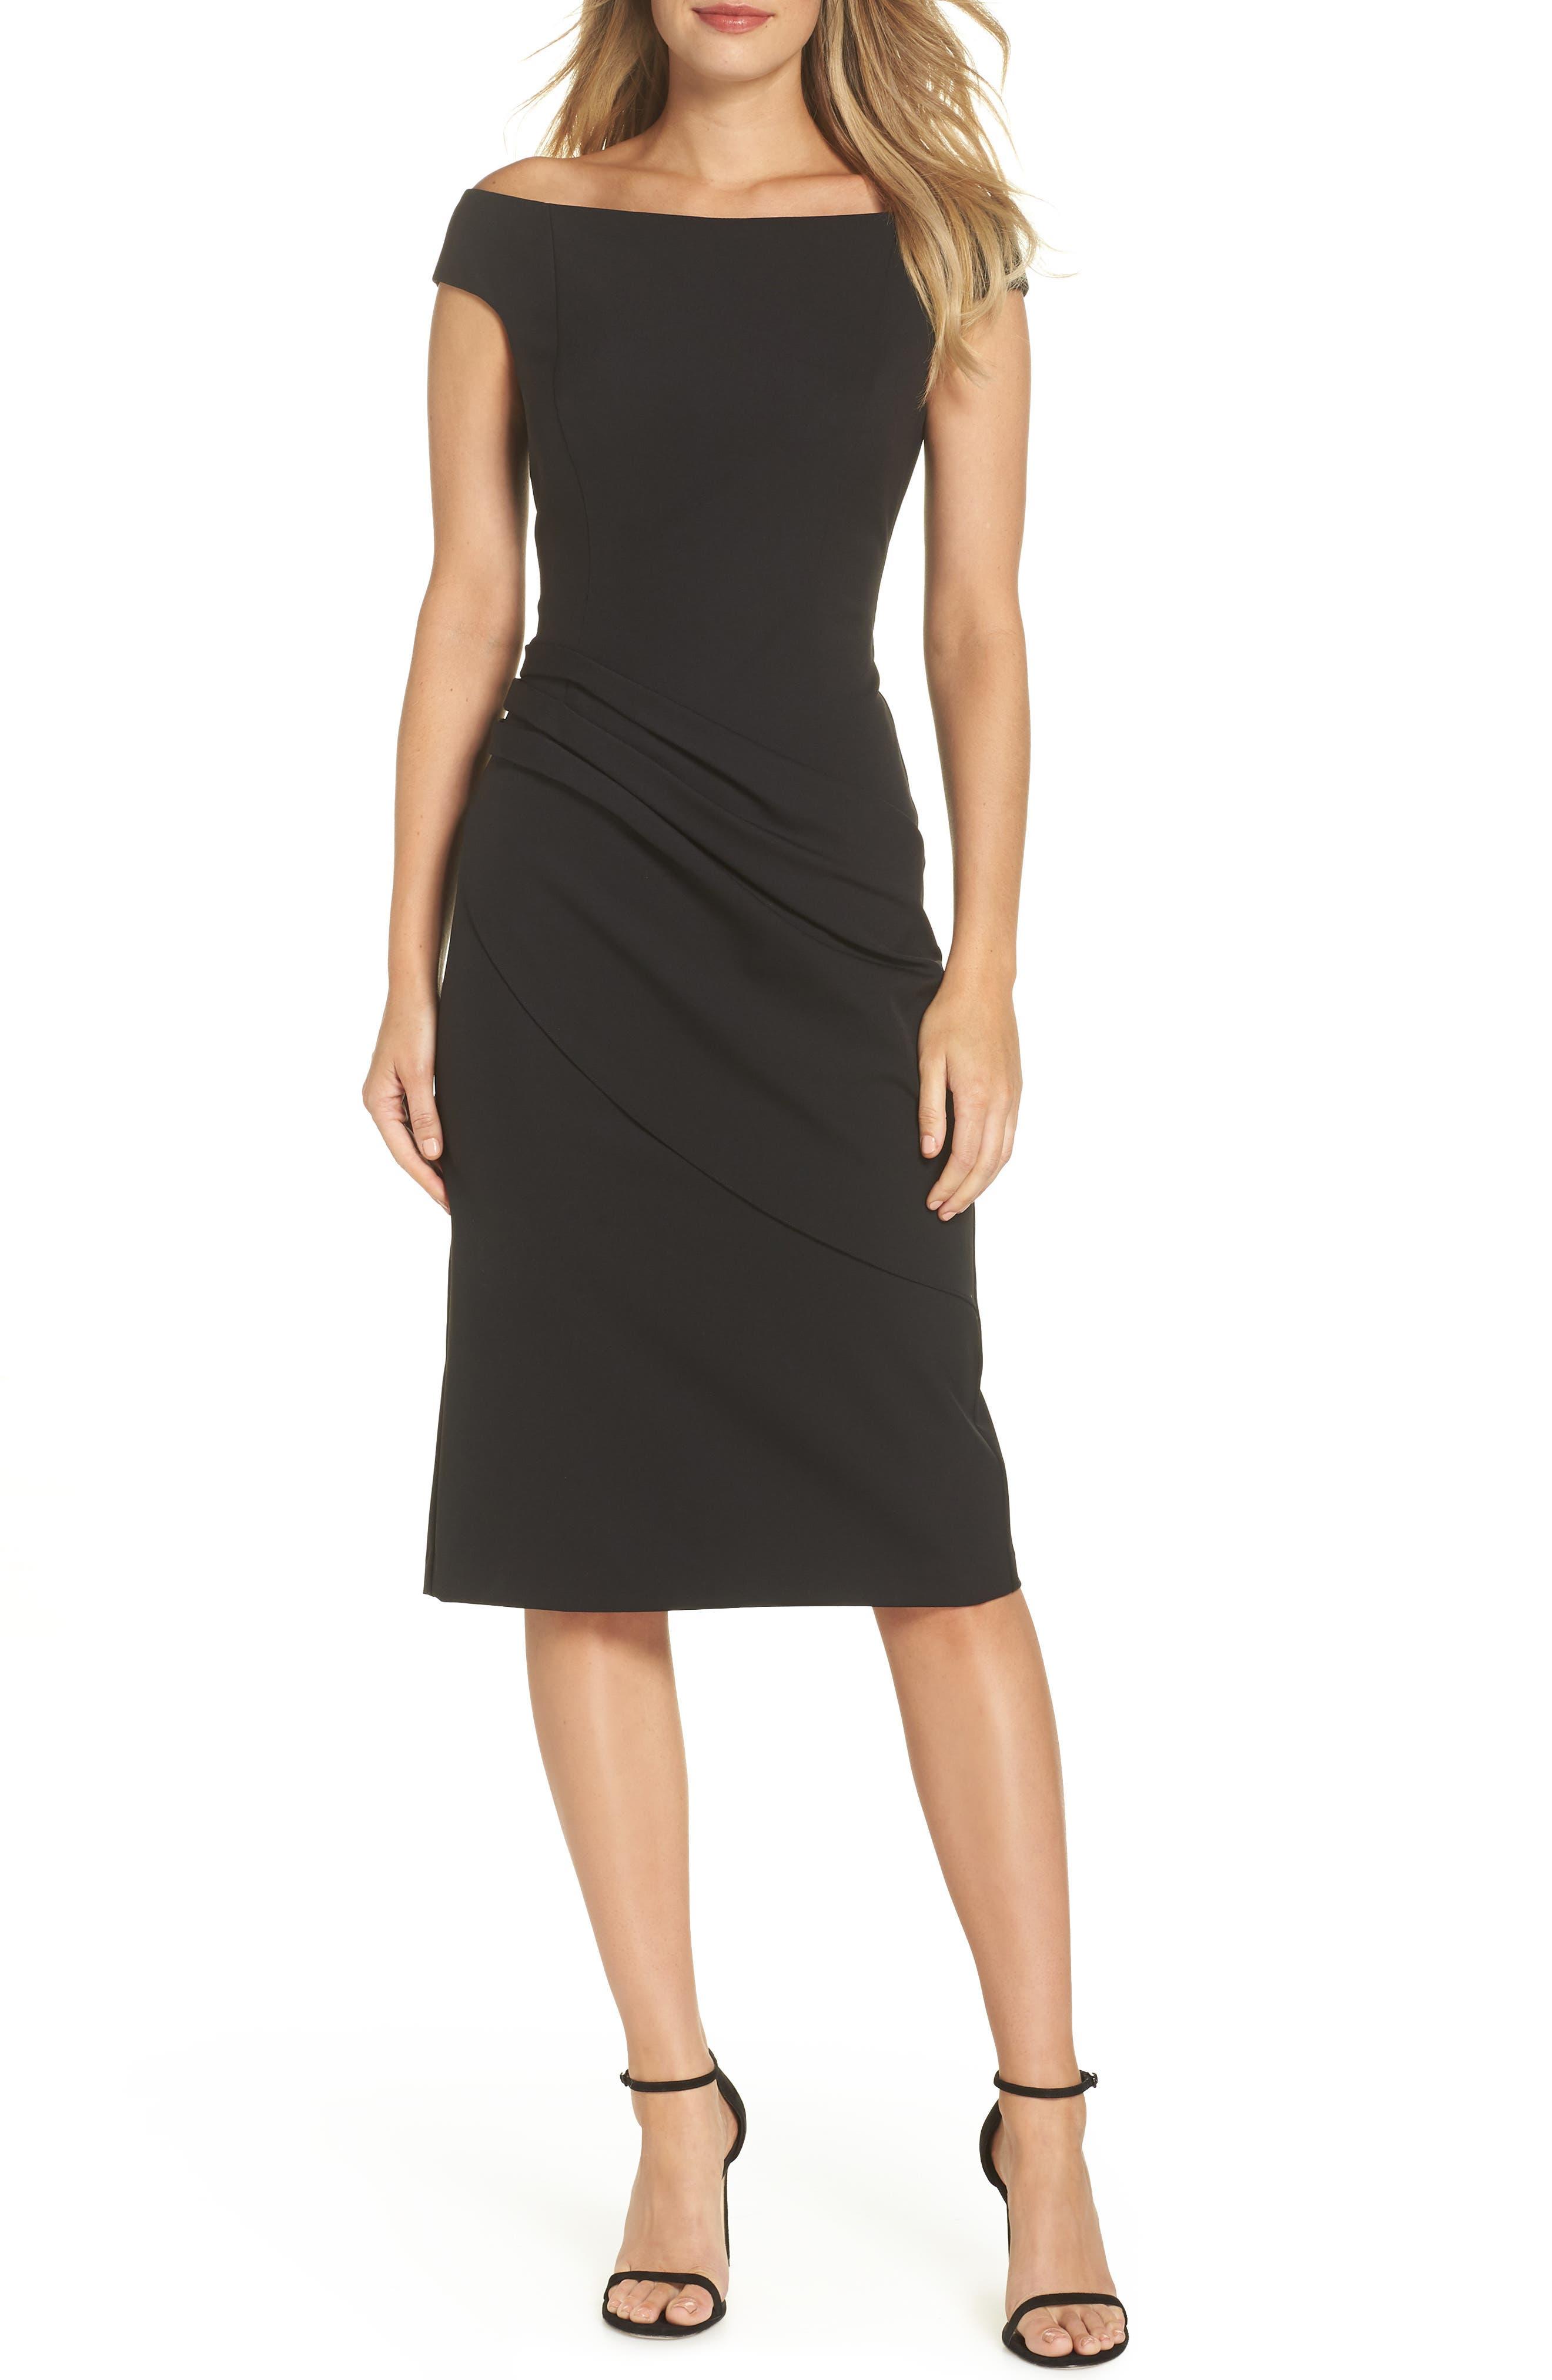 ELIZA J, Off the Shoulder Sheath Dress, Main thumbnail 1, color, BLACK